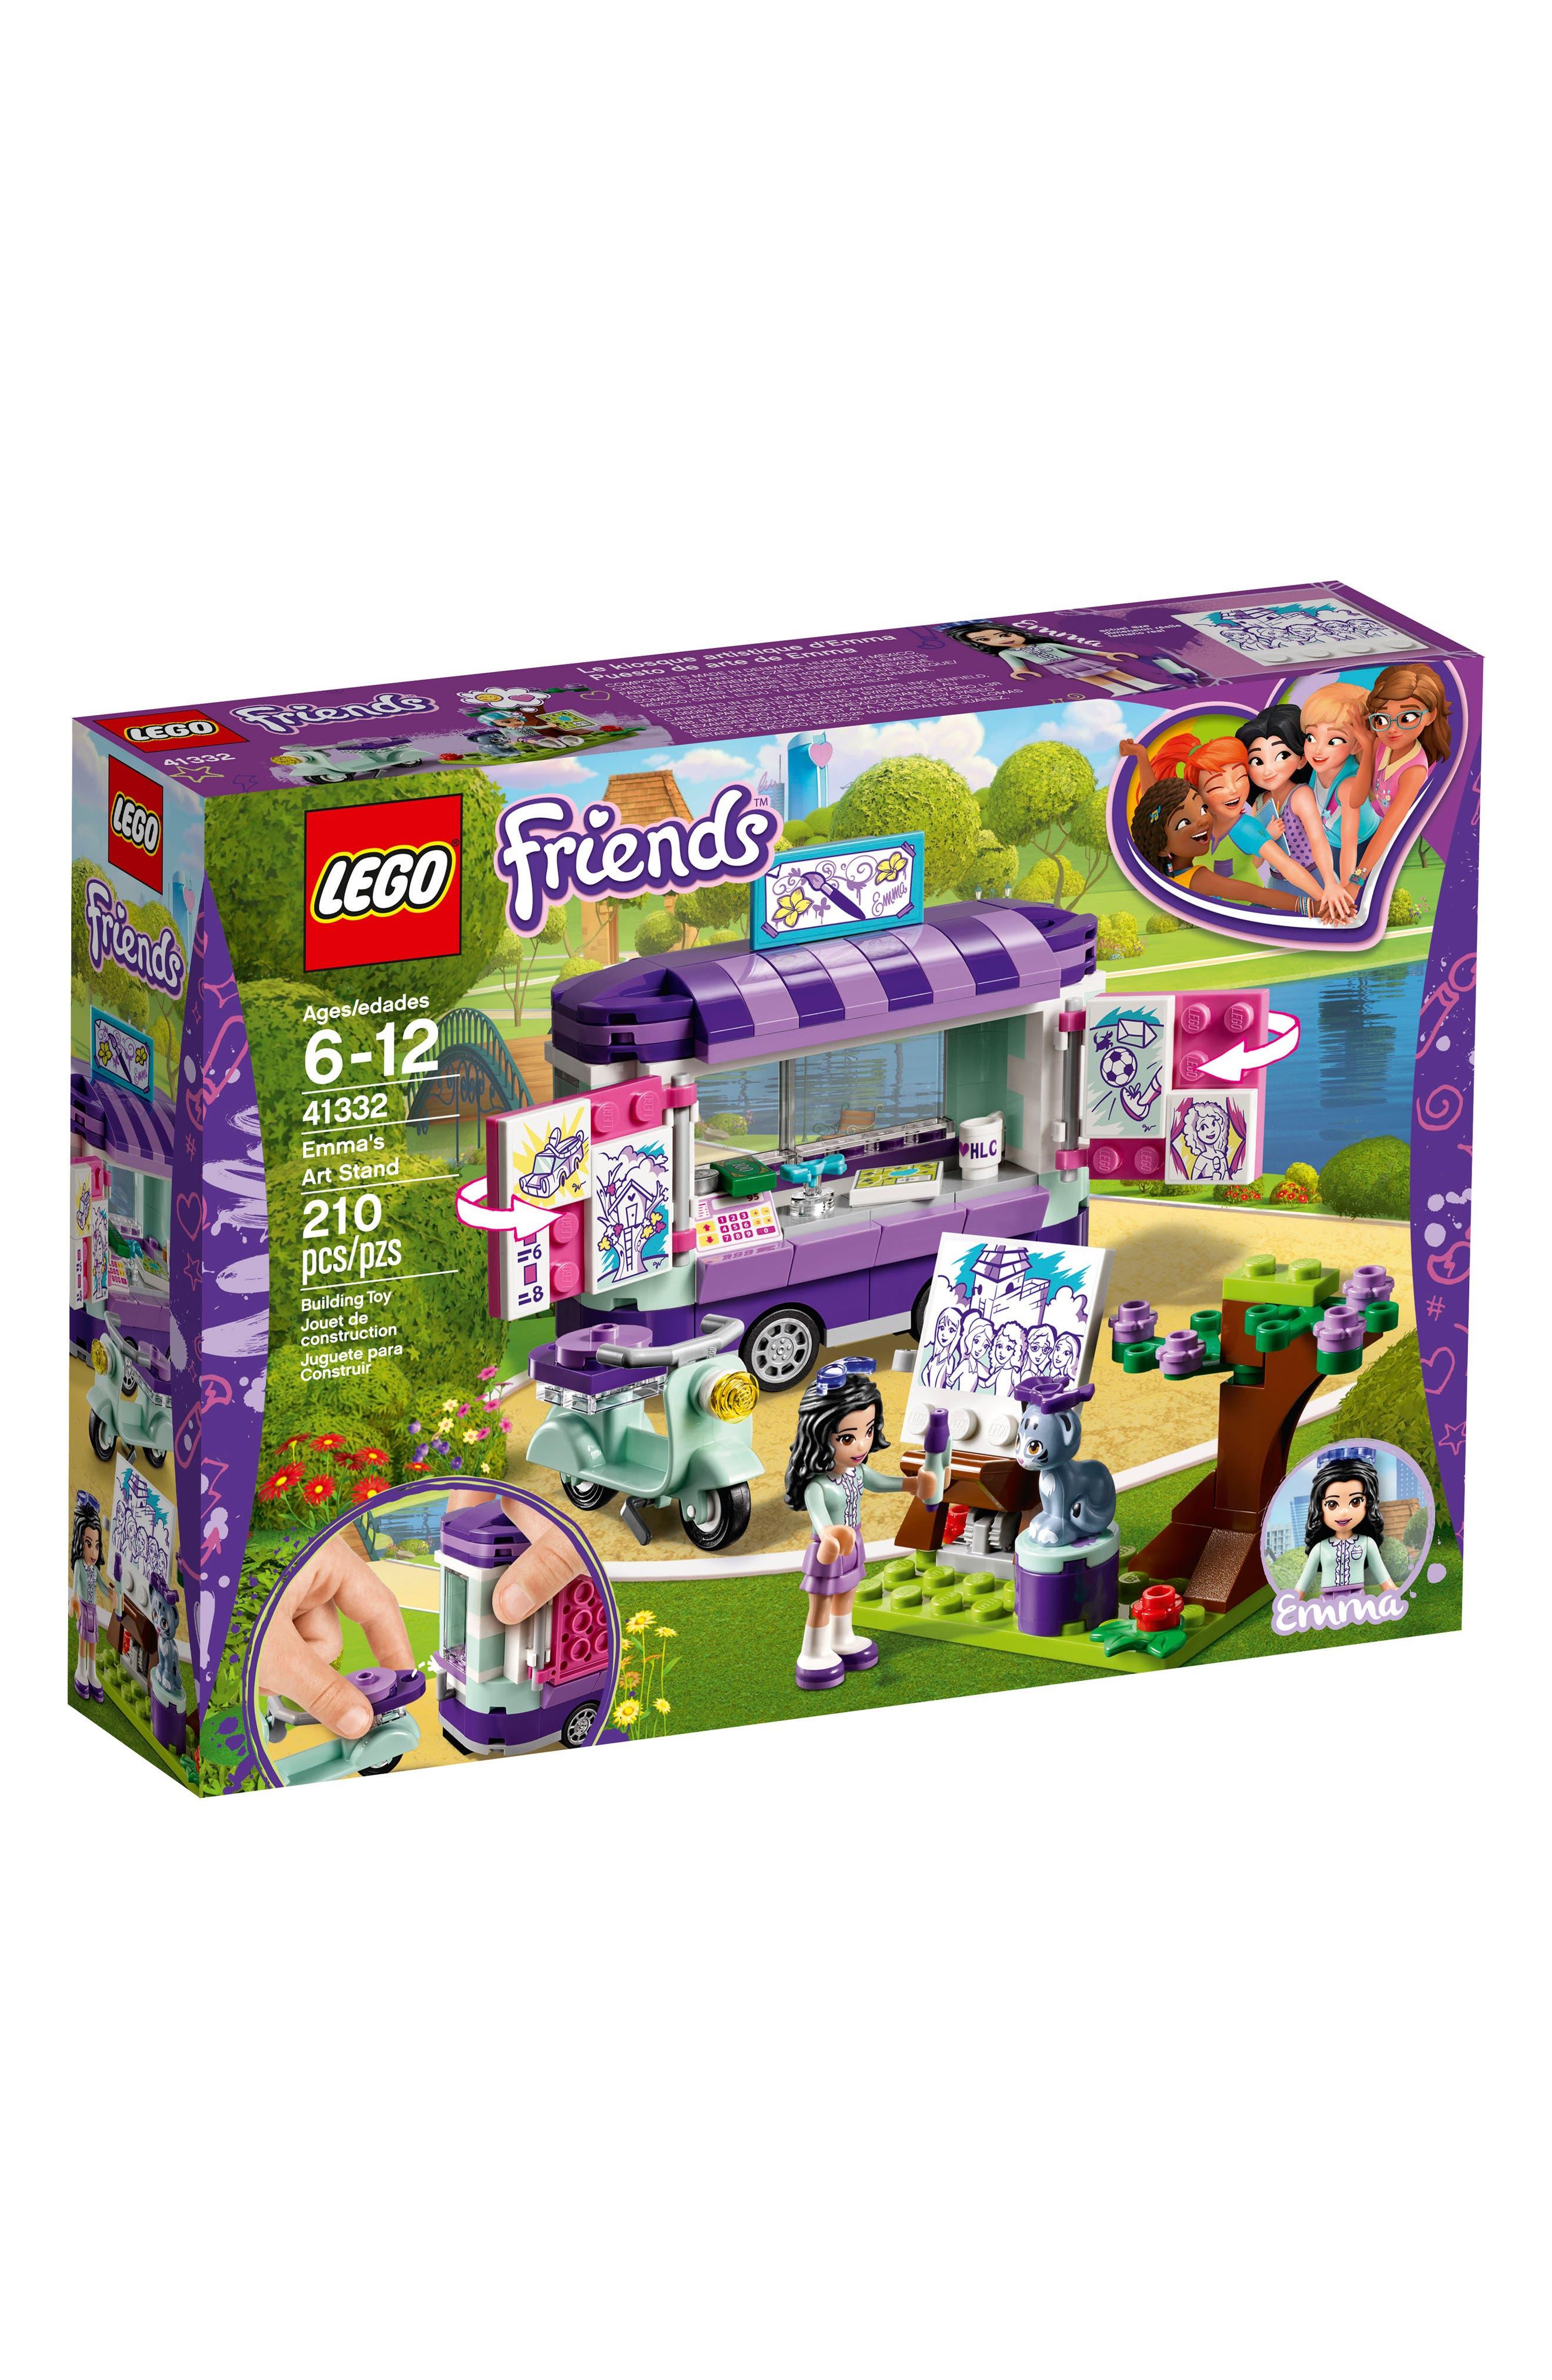 LEGO Friends Emma's Art Stand Play Set - 41332,                             Main thumbnail 1, color,                             Multi